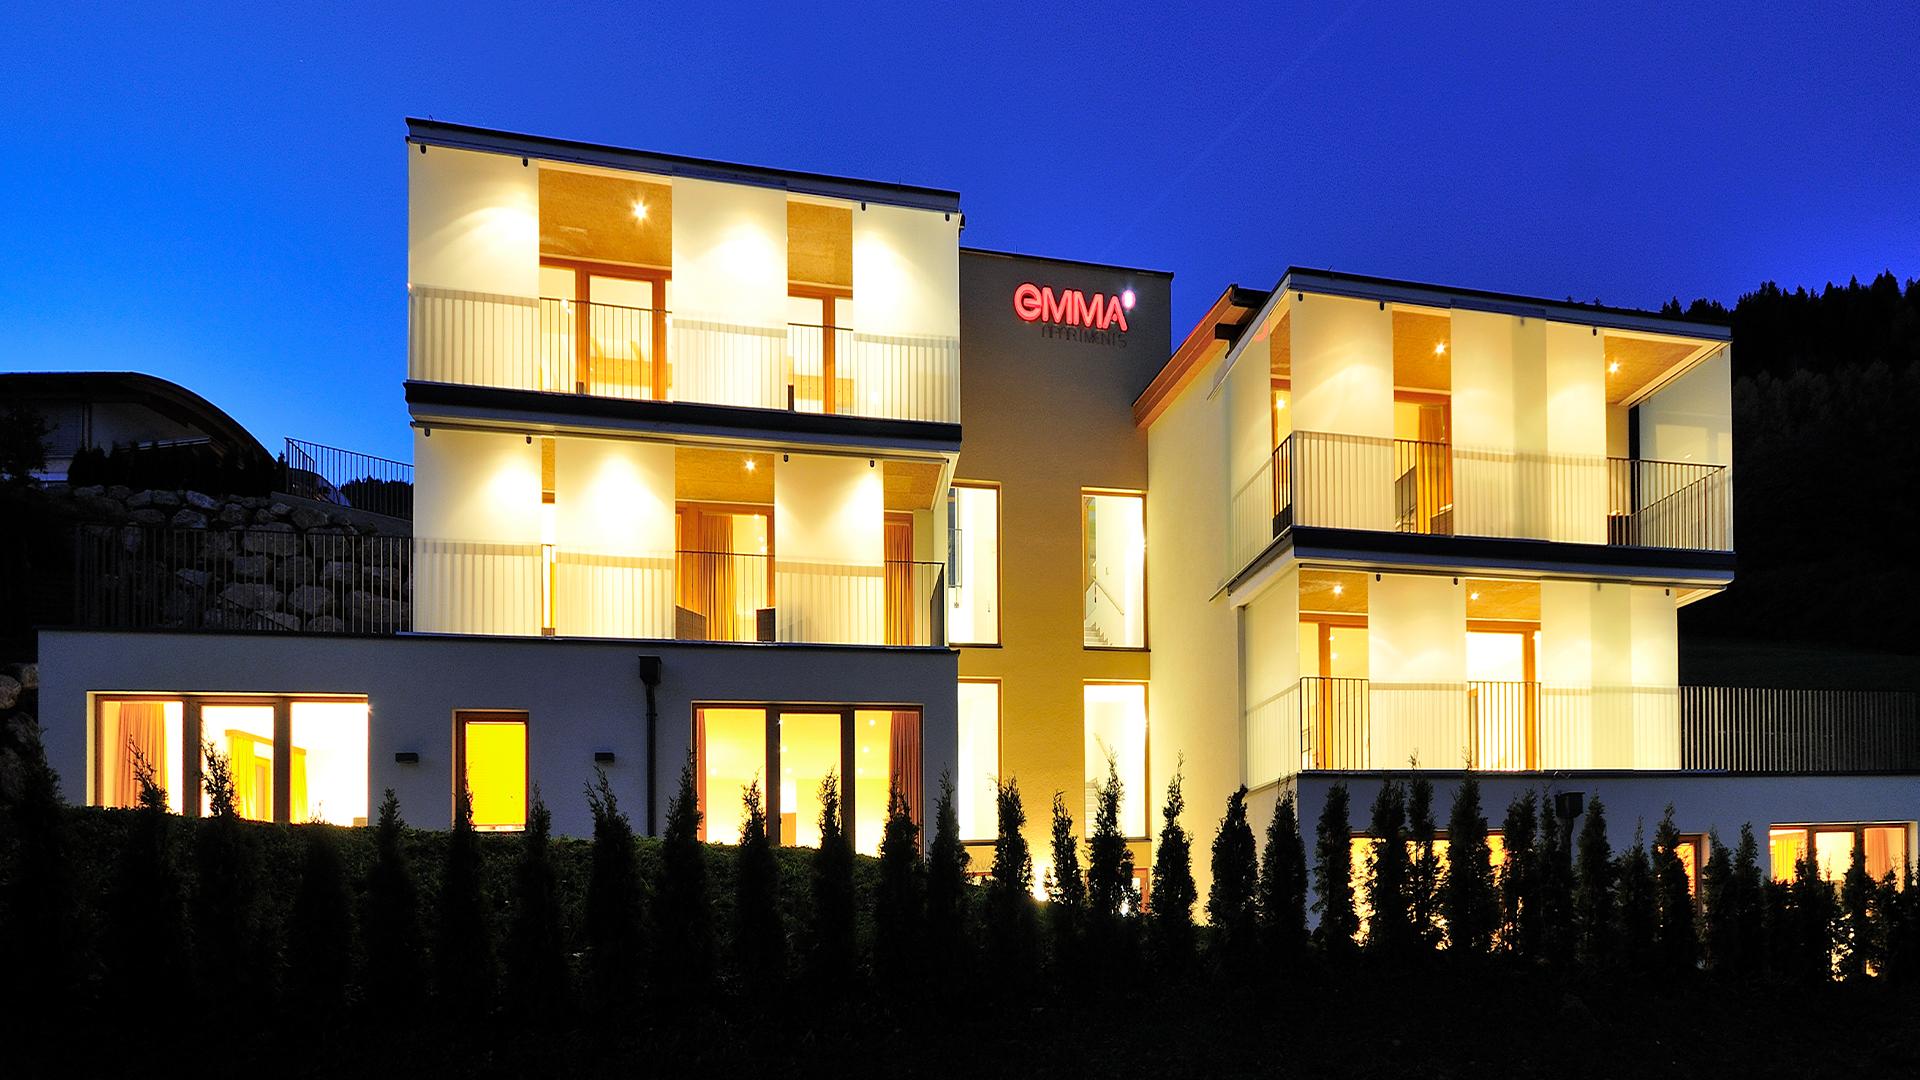 emma-apartments-kaprun-holiday-salzburg-appartementen-urlaub